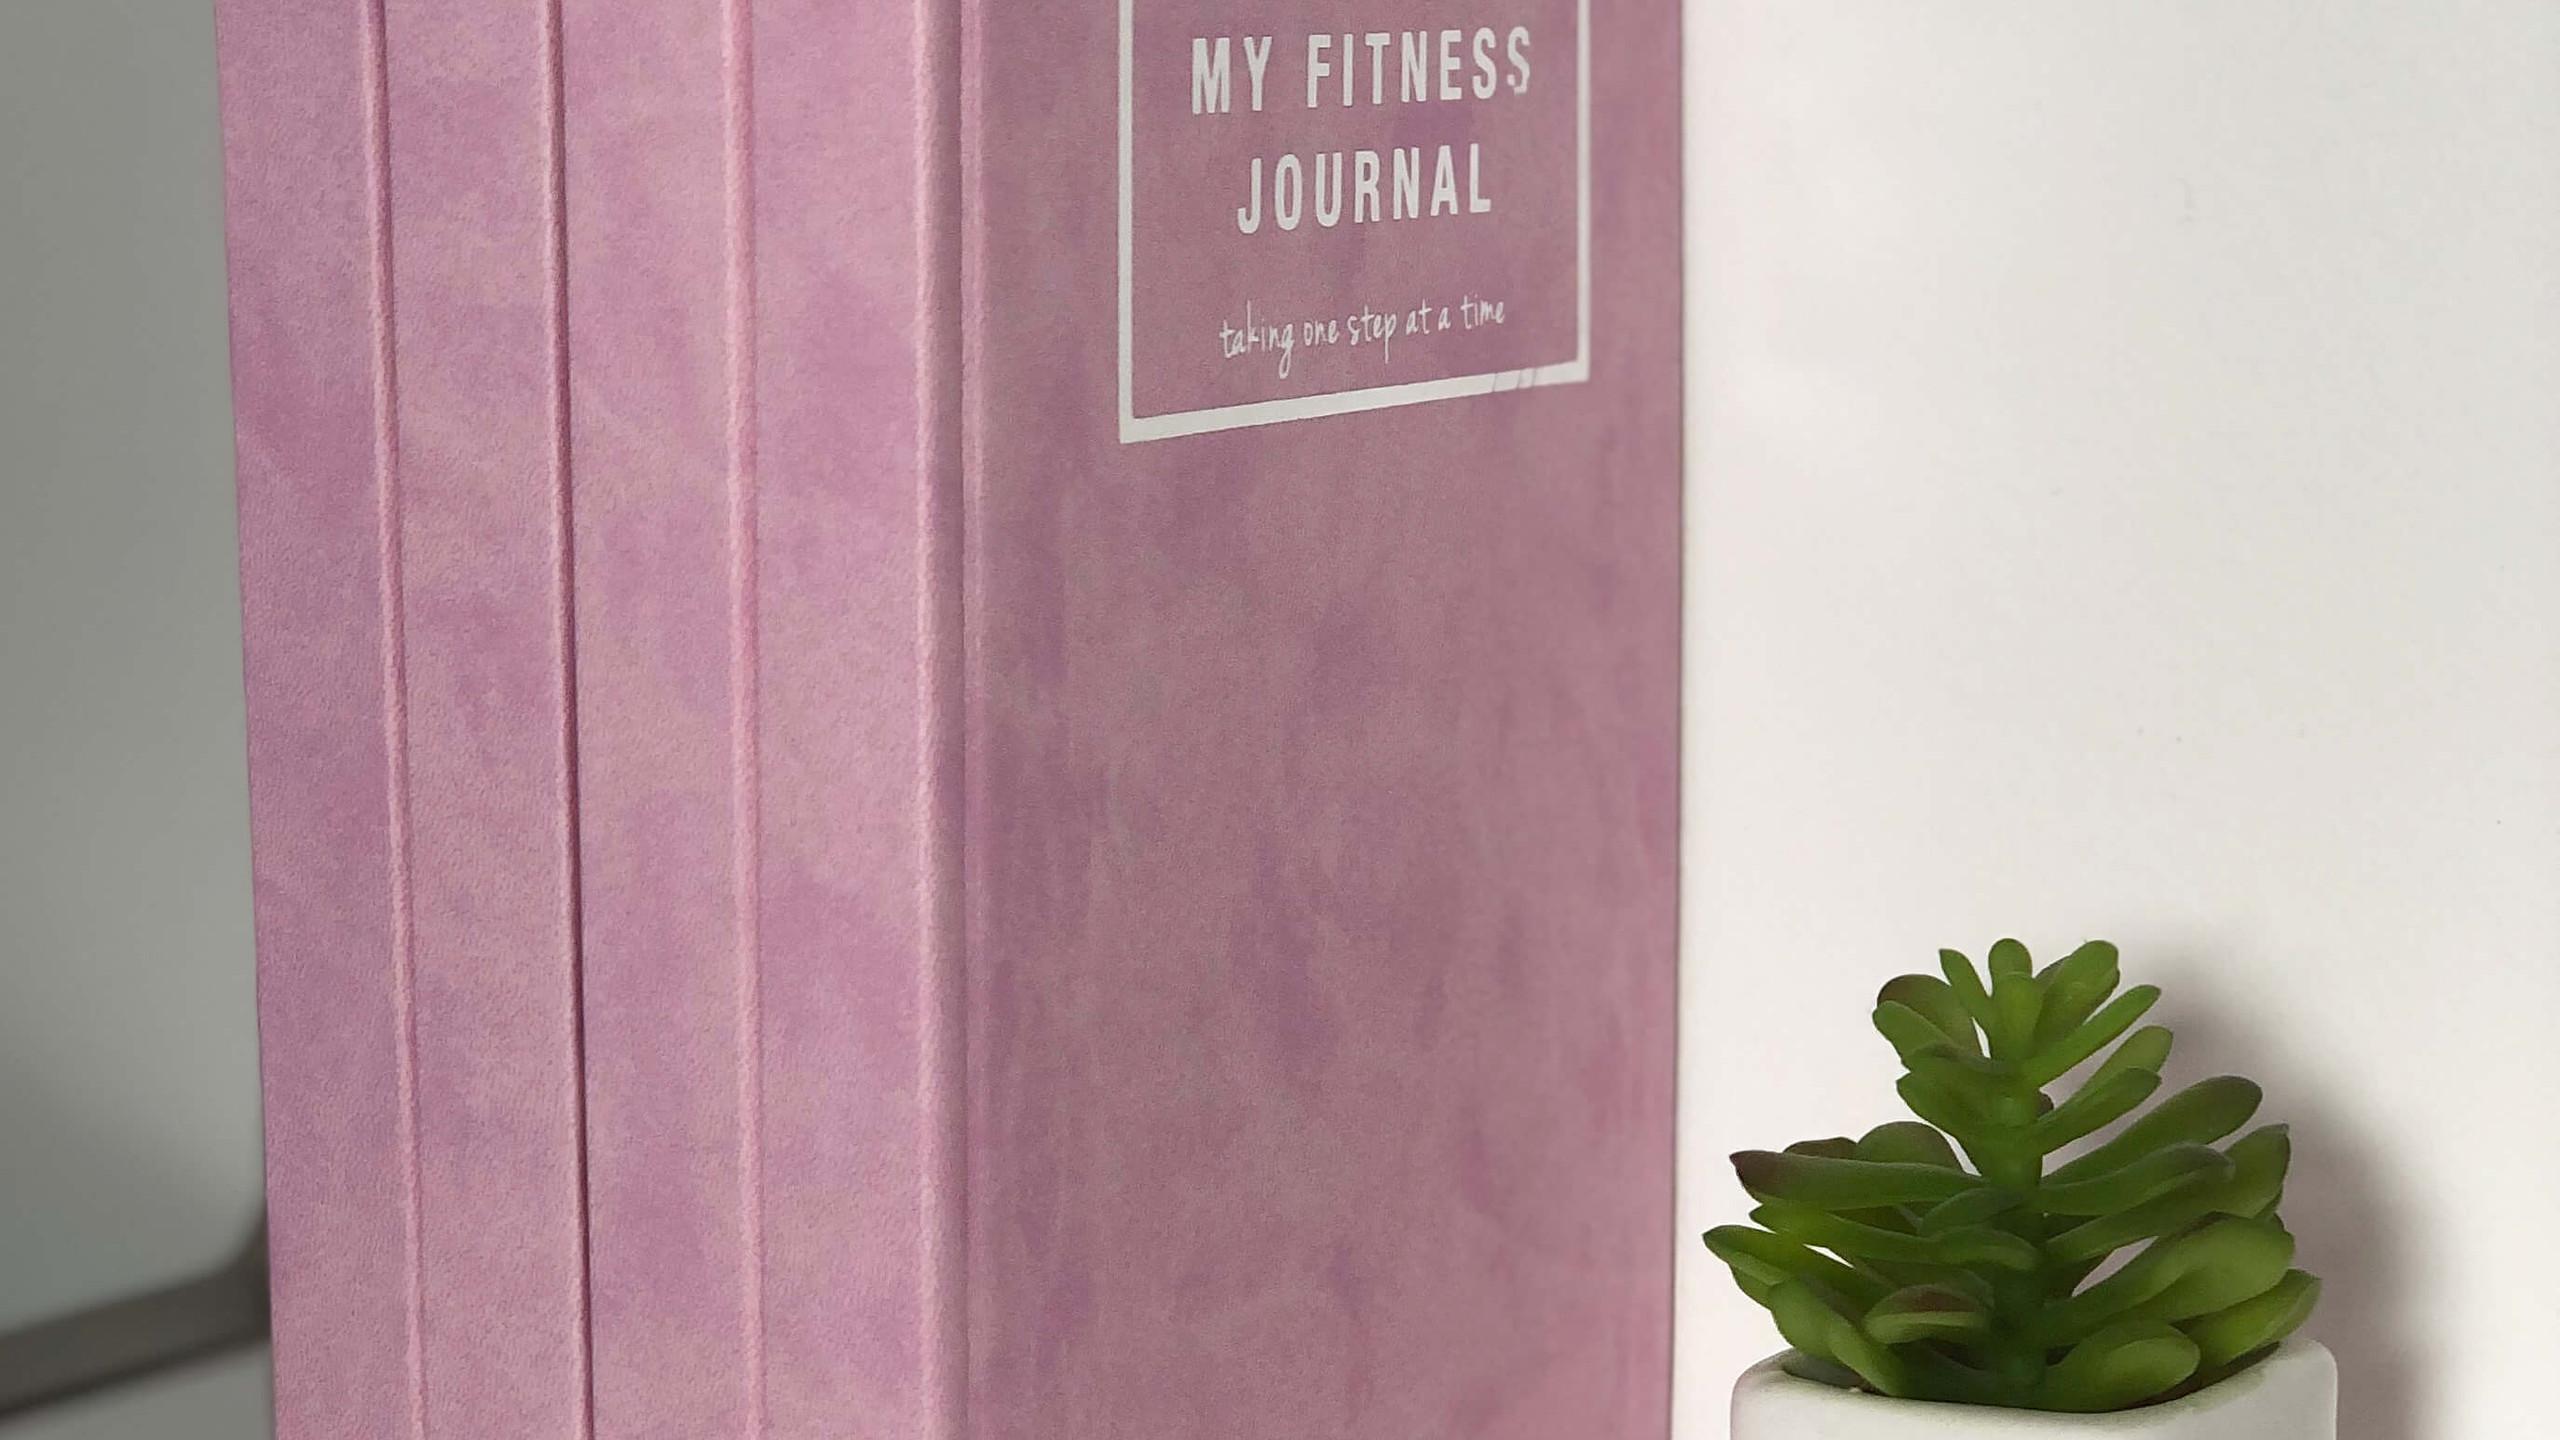 My Fitness Journal